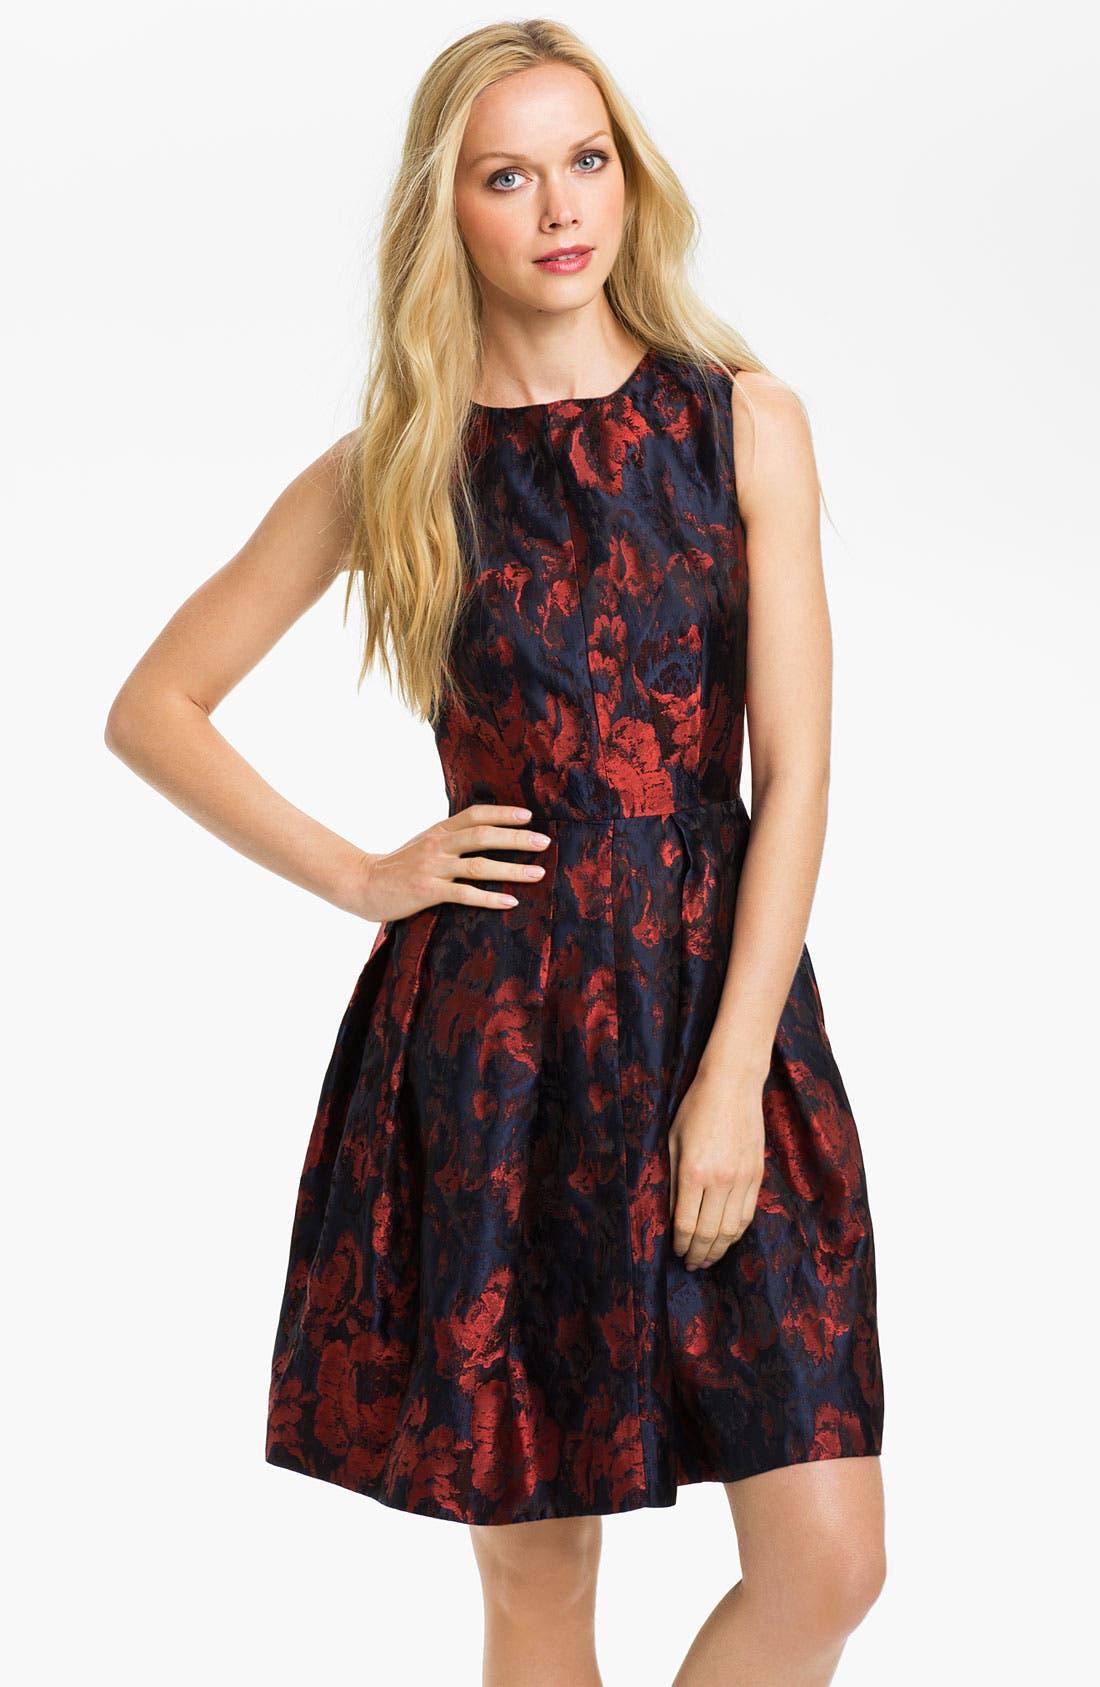 Alternate Image 1 Selected - Taylor Dresses Brocade Fit & Flare Dress